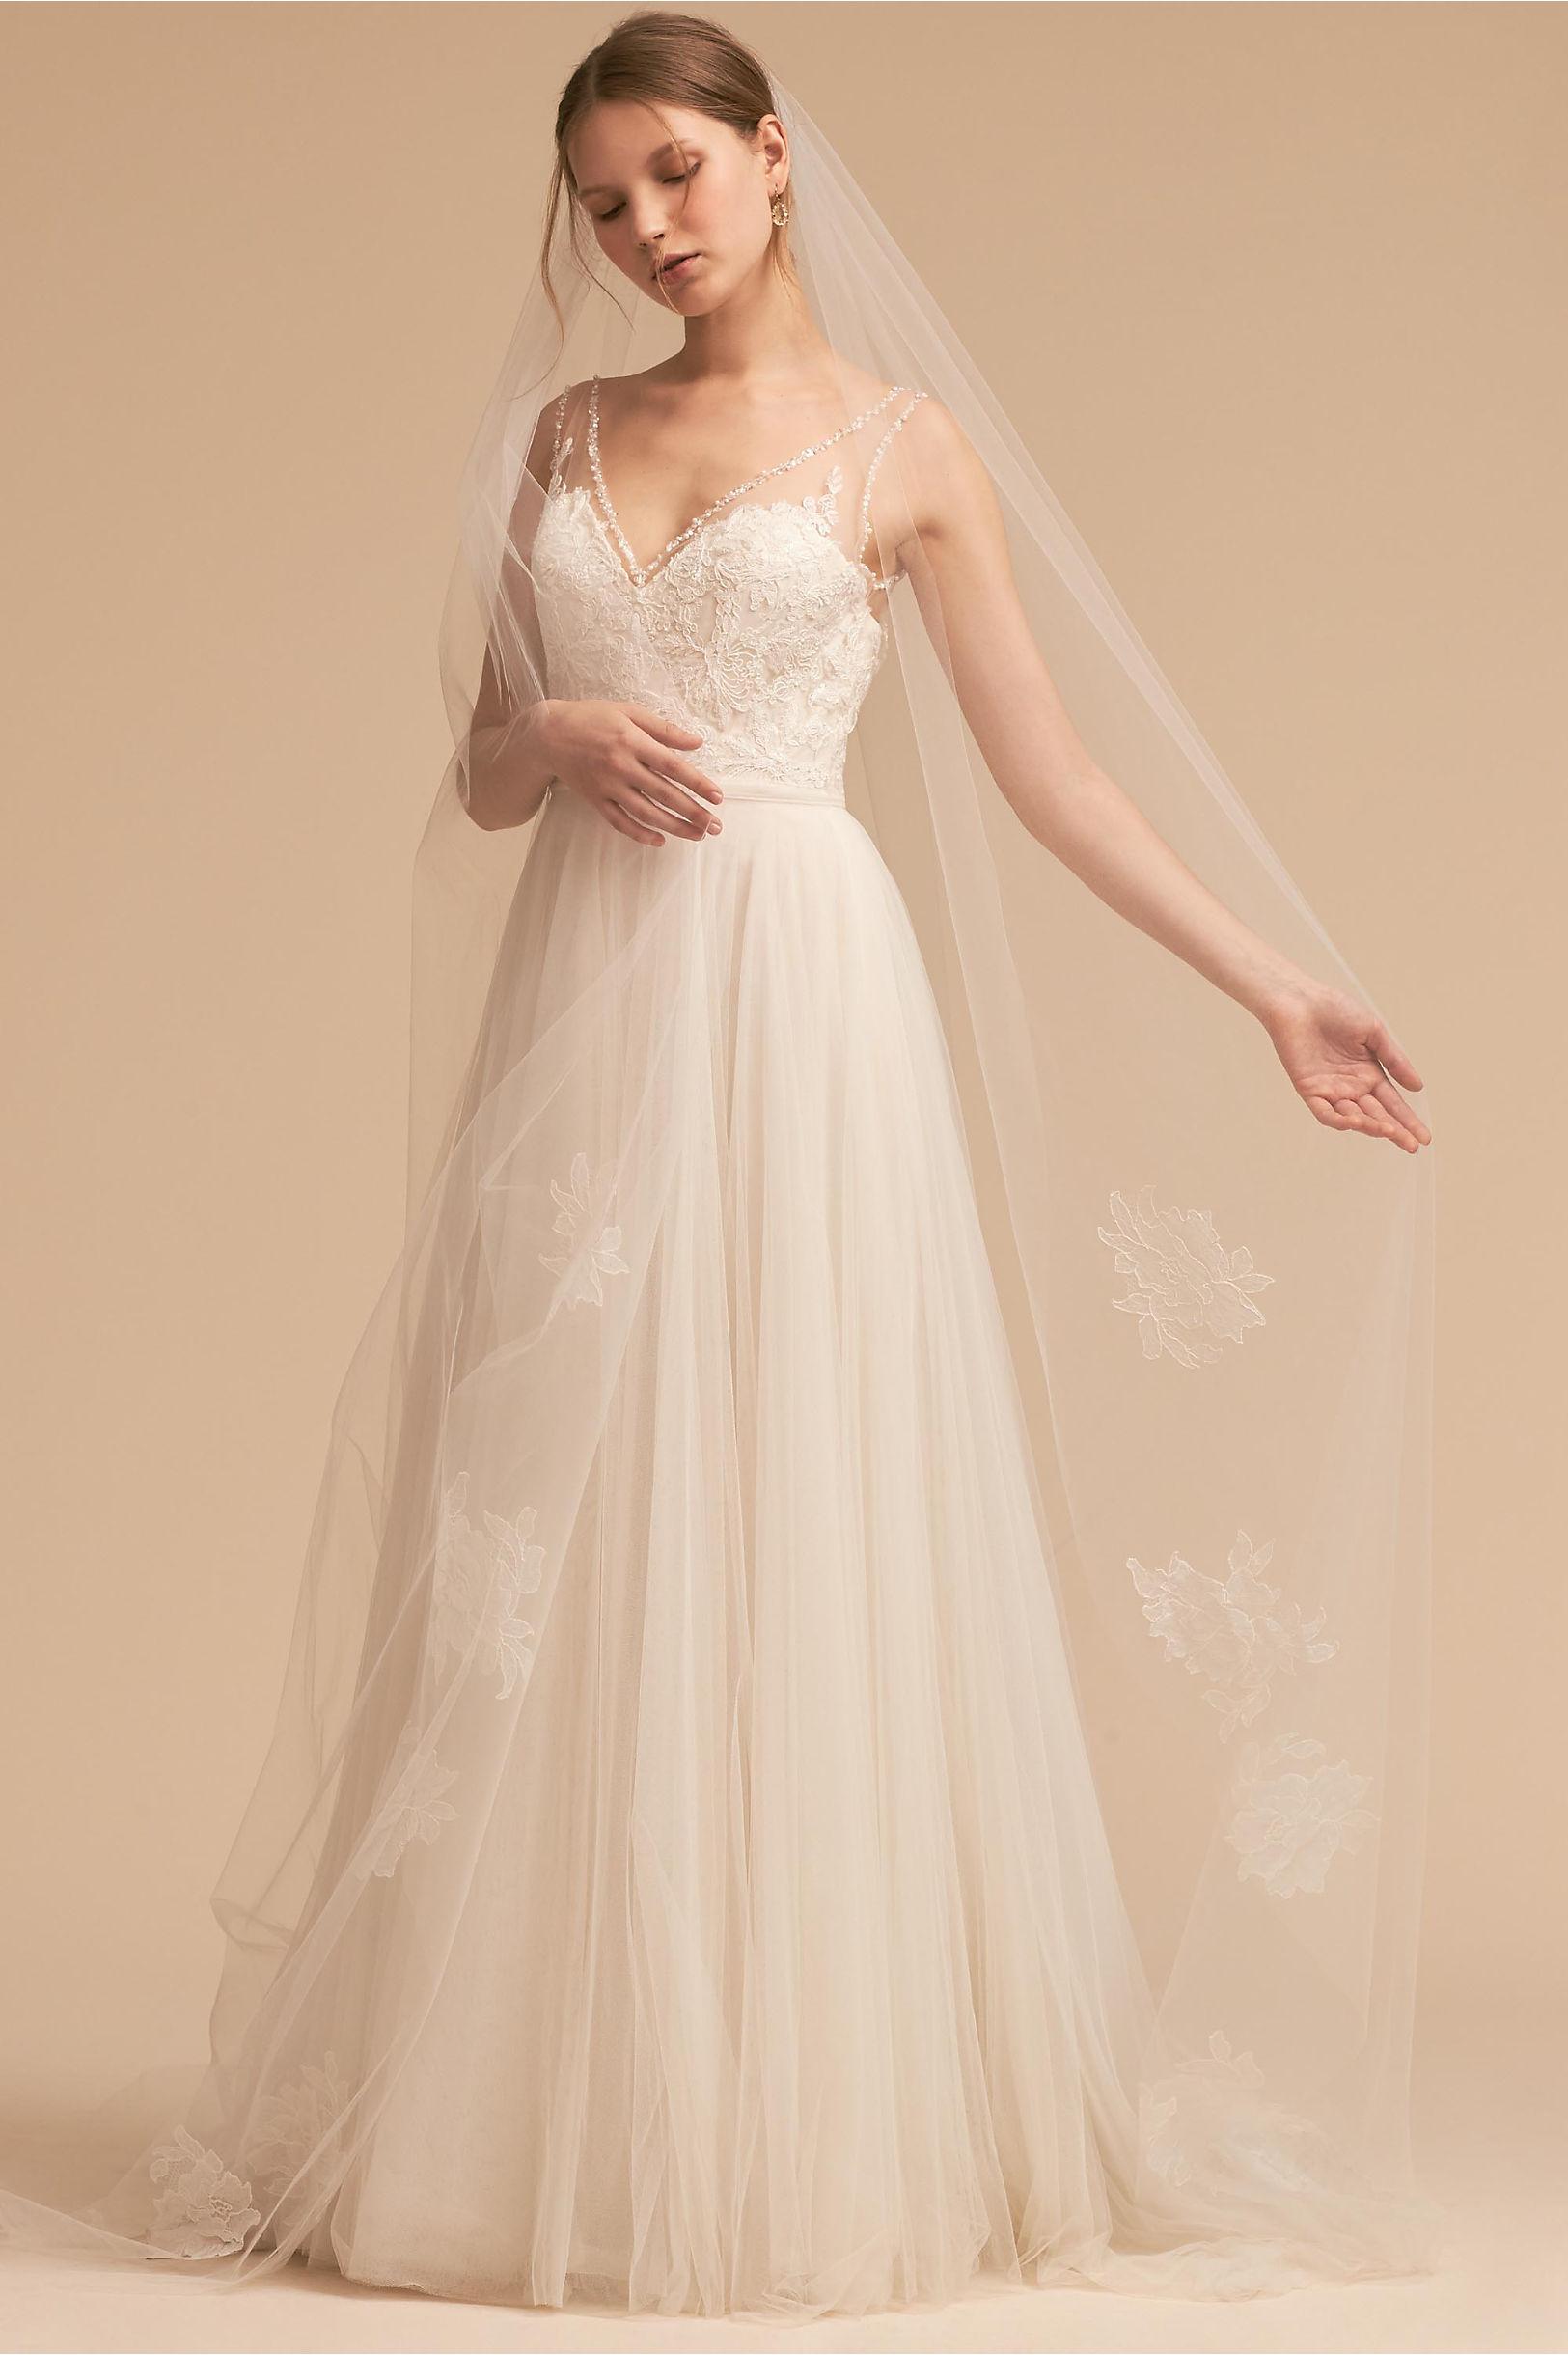 Bridal Accessories | Wedding Accessories for Brides | BHLDN